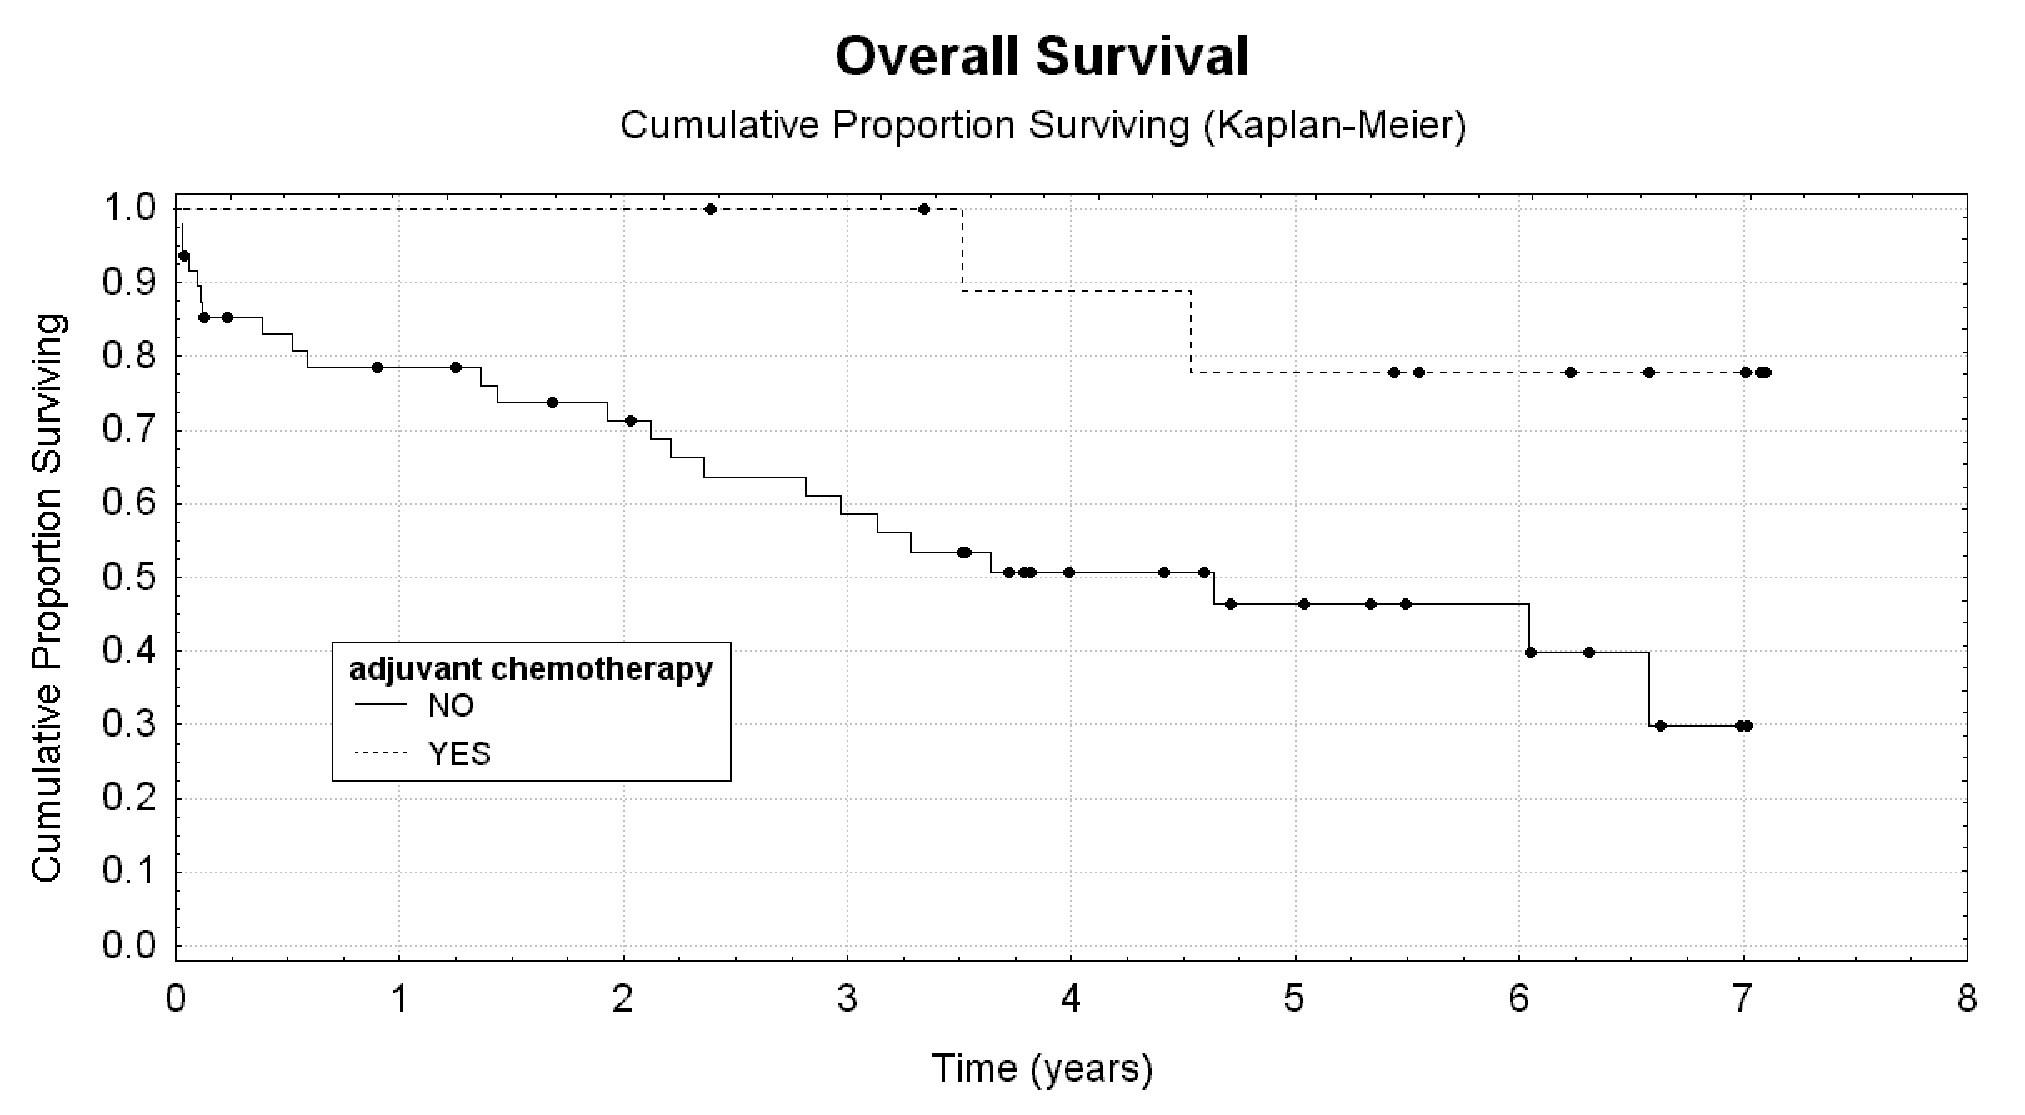 Adjuvantní chemoterapie jako prognostický faktor celkového přežití nemocných s komplikacemi IIIA, IIIB, IV a V hodnocenými dle Claviena a Dinda Graph 12: Adjuvant chemotherapy as a prognostic factor for overal survival in patients with Grade IIIA, IIIB, IV, V complications evaluated according to Clavien and Dindo